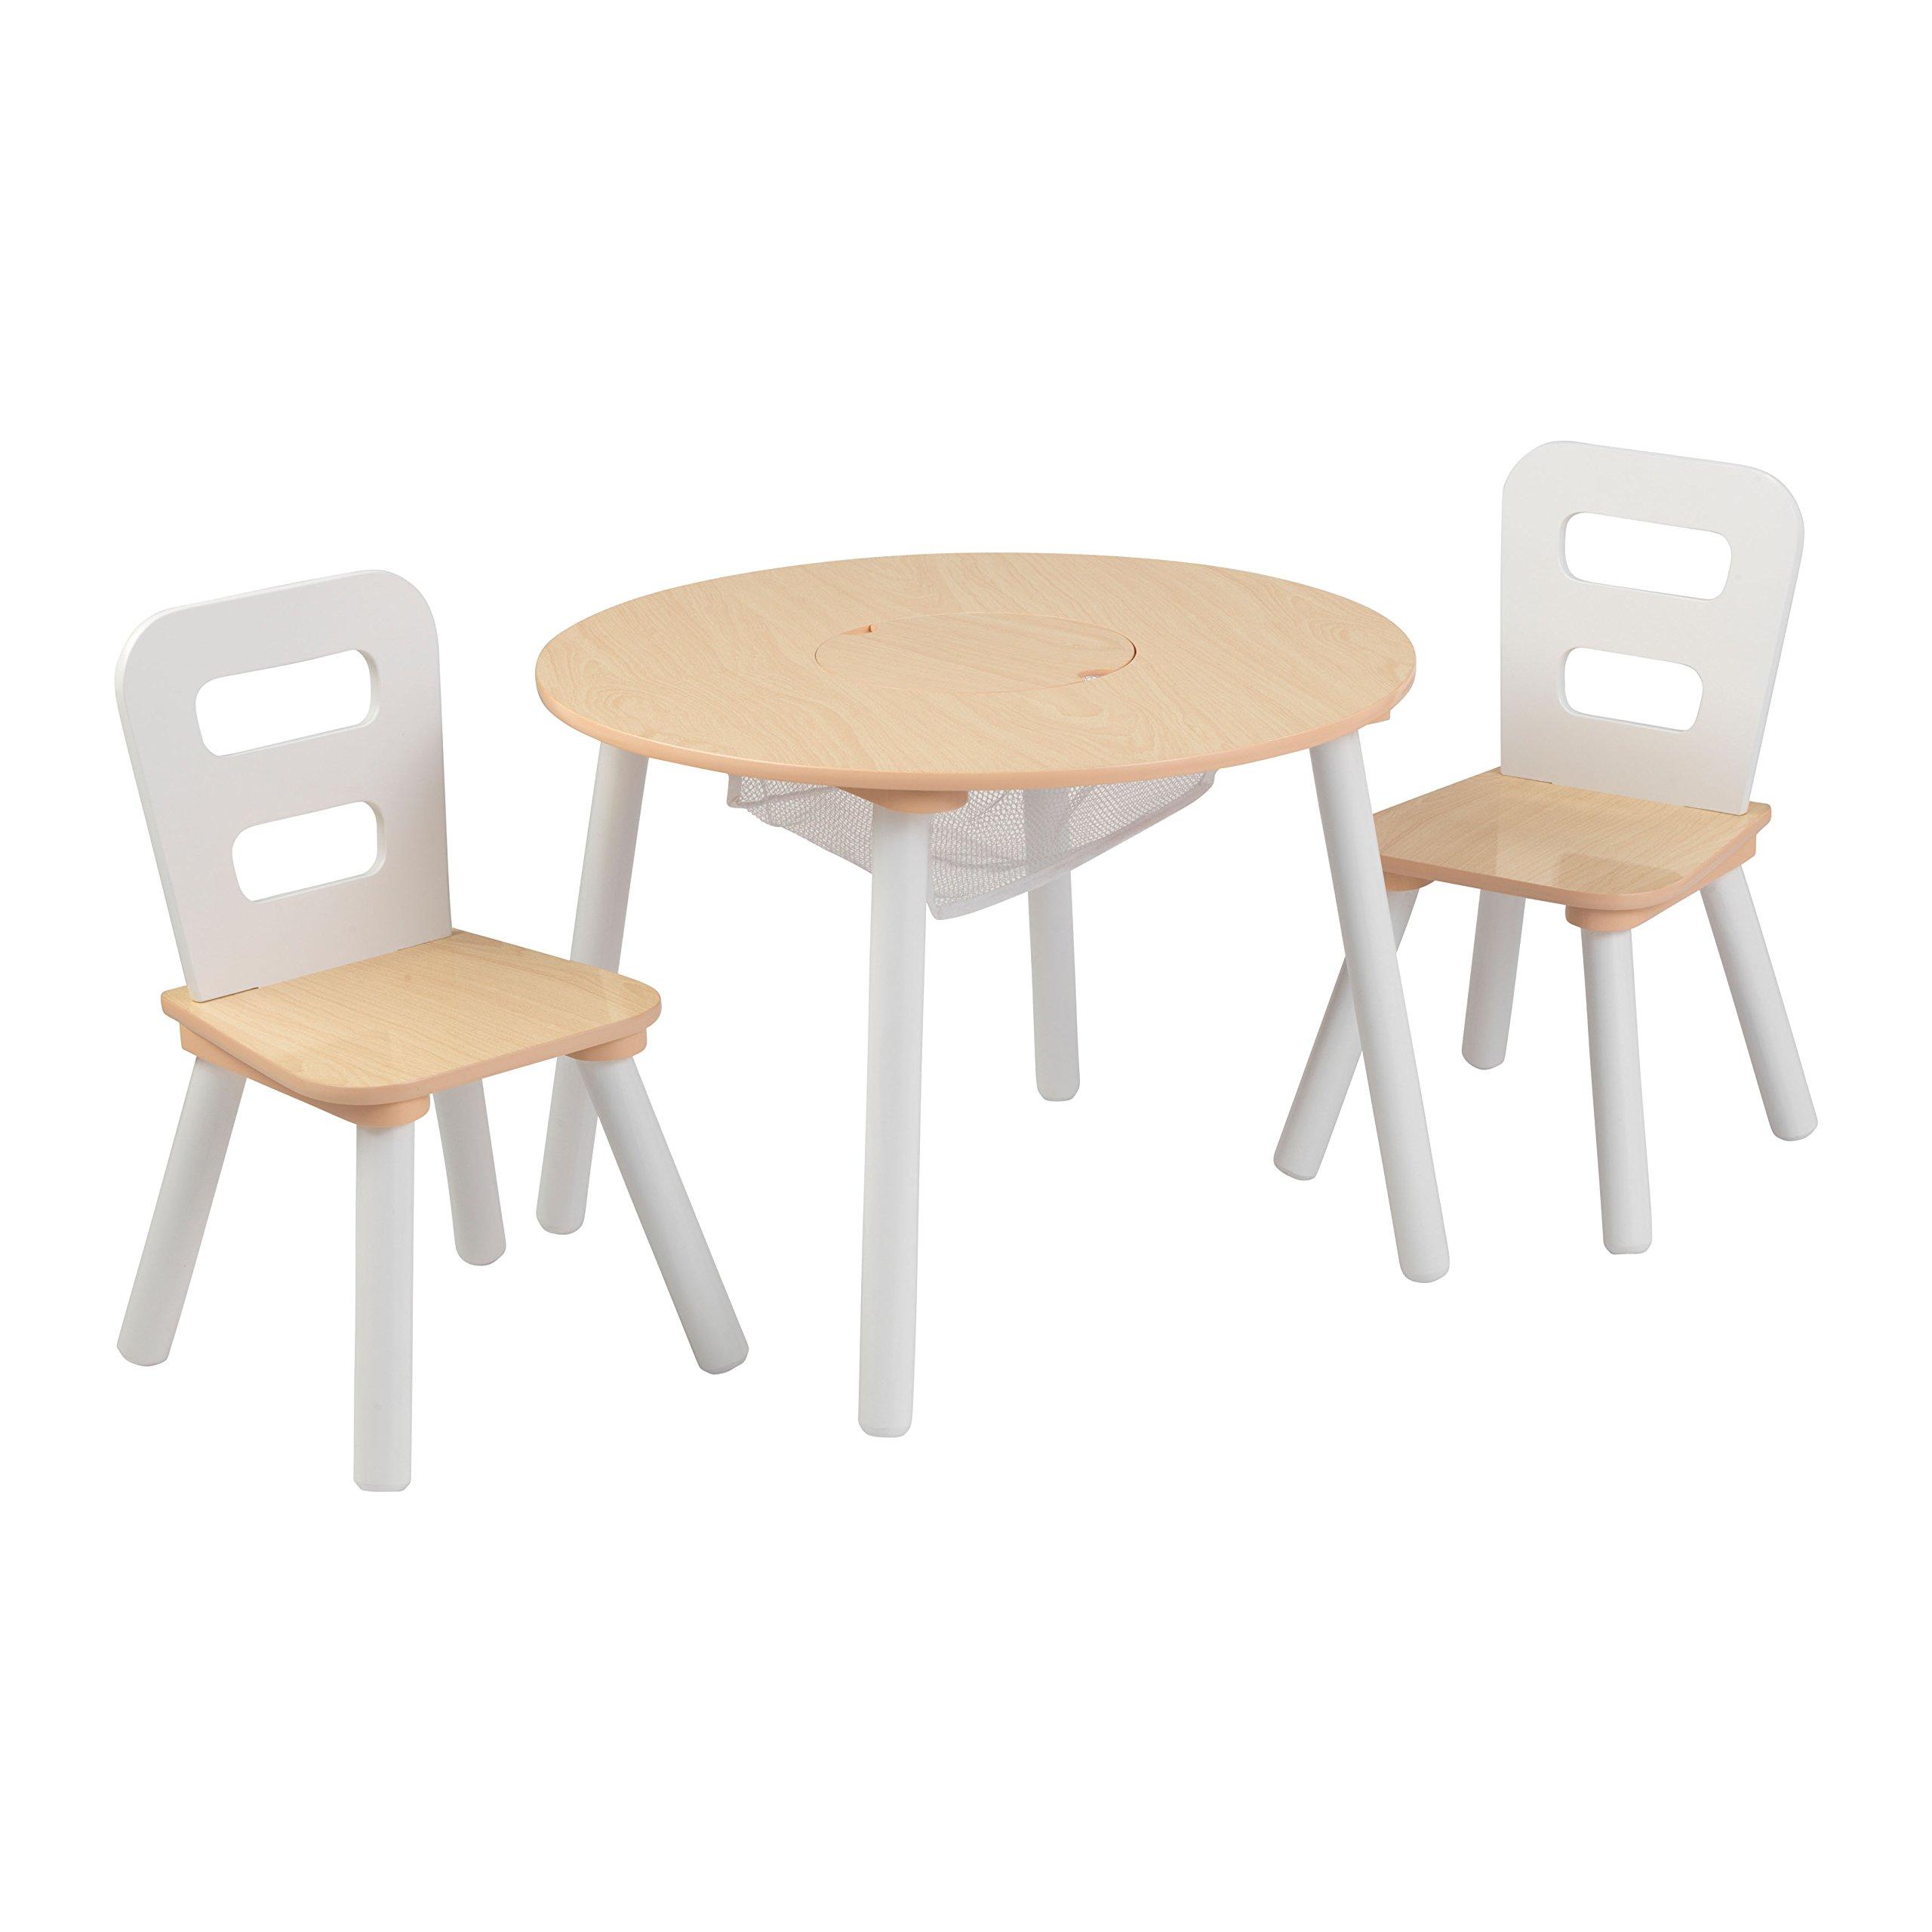 KidKraft Round Storage Table & 2 Chair Set, White/Natural by KidKraft